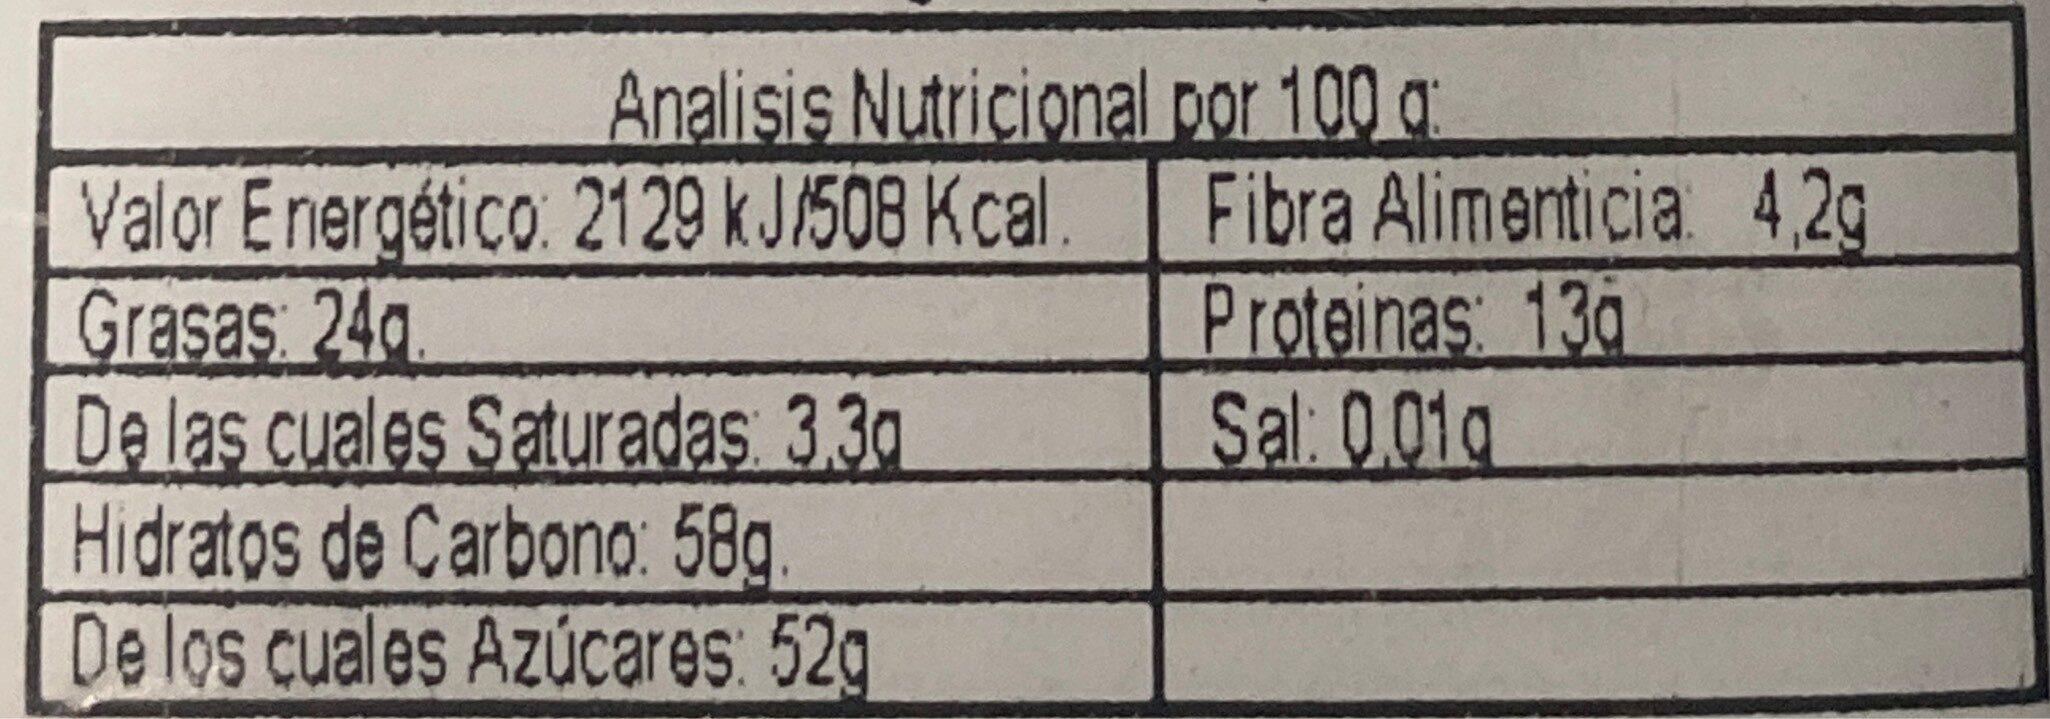 Garrapiñadas de Cacahuete - Nutrition facts - en